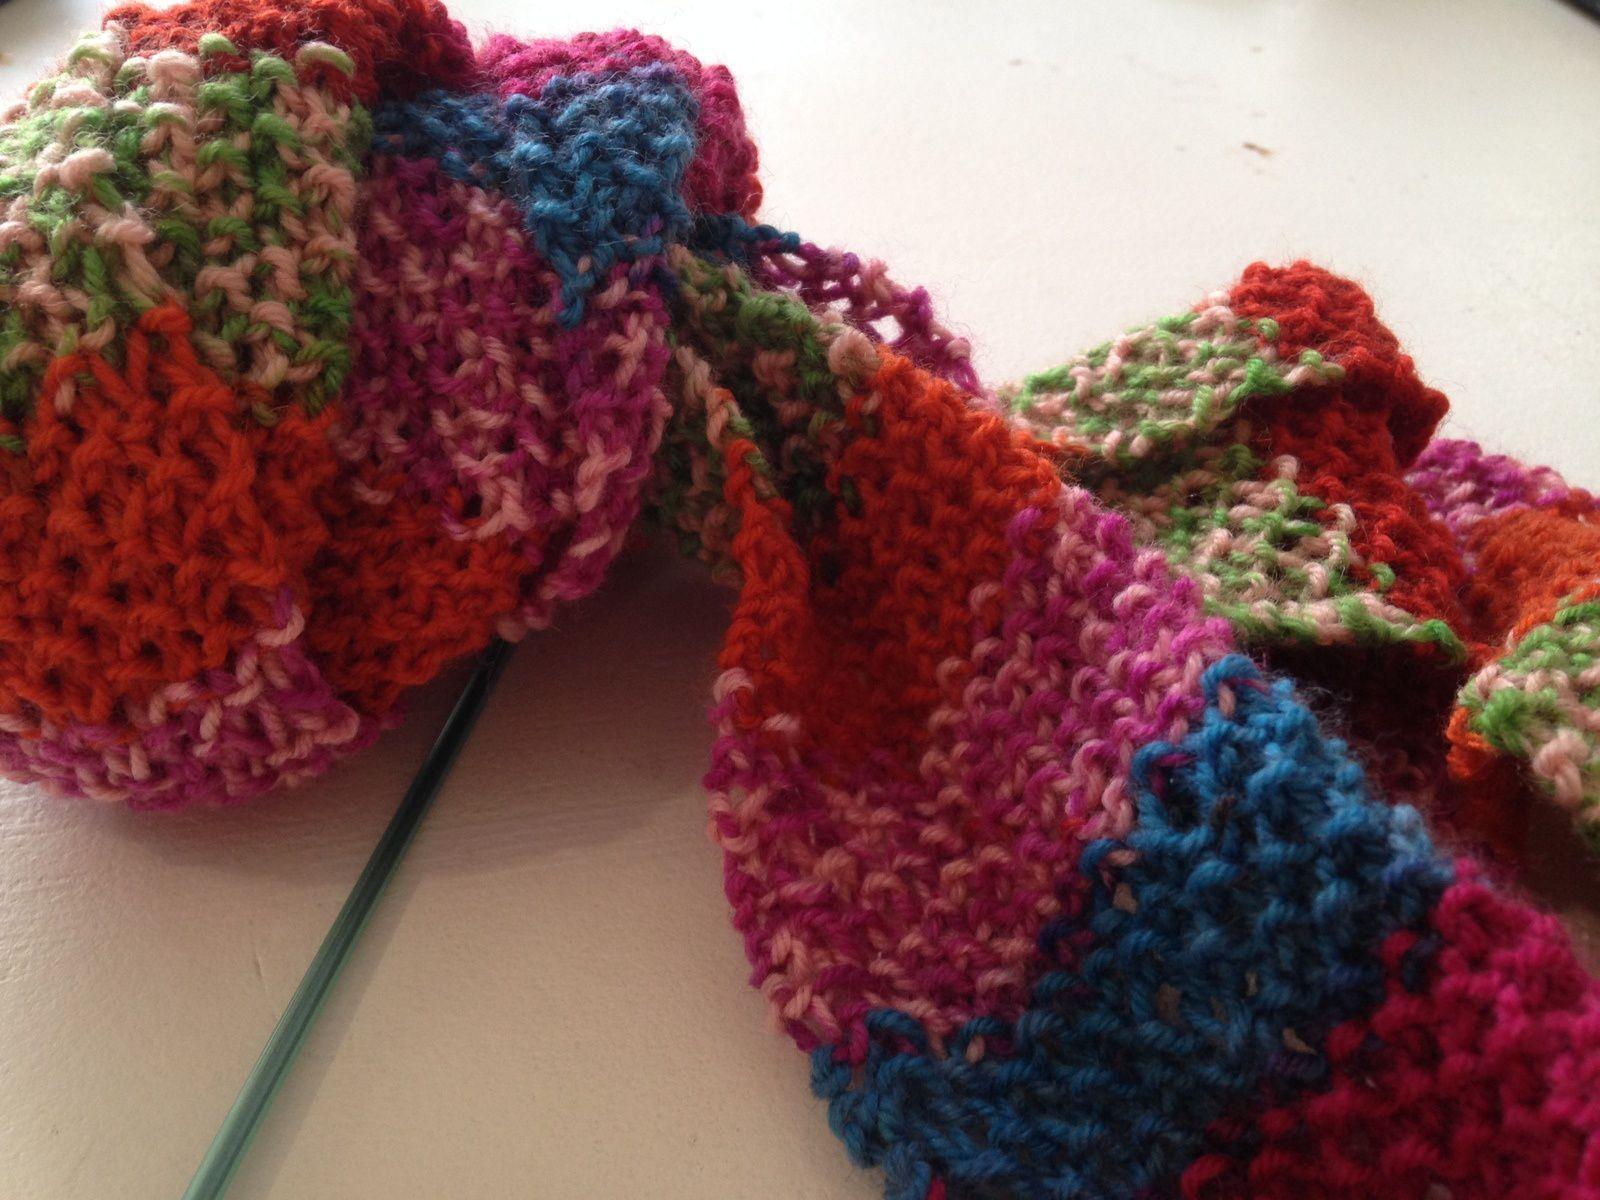 Echarpe  charlotteblabla multicolore laine mérinos cachemire sur charlotteblablablog